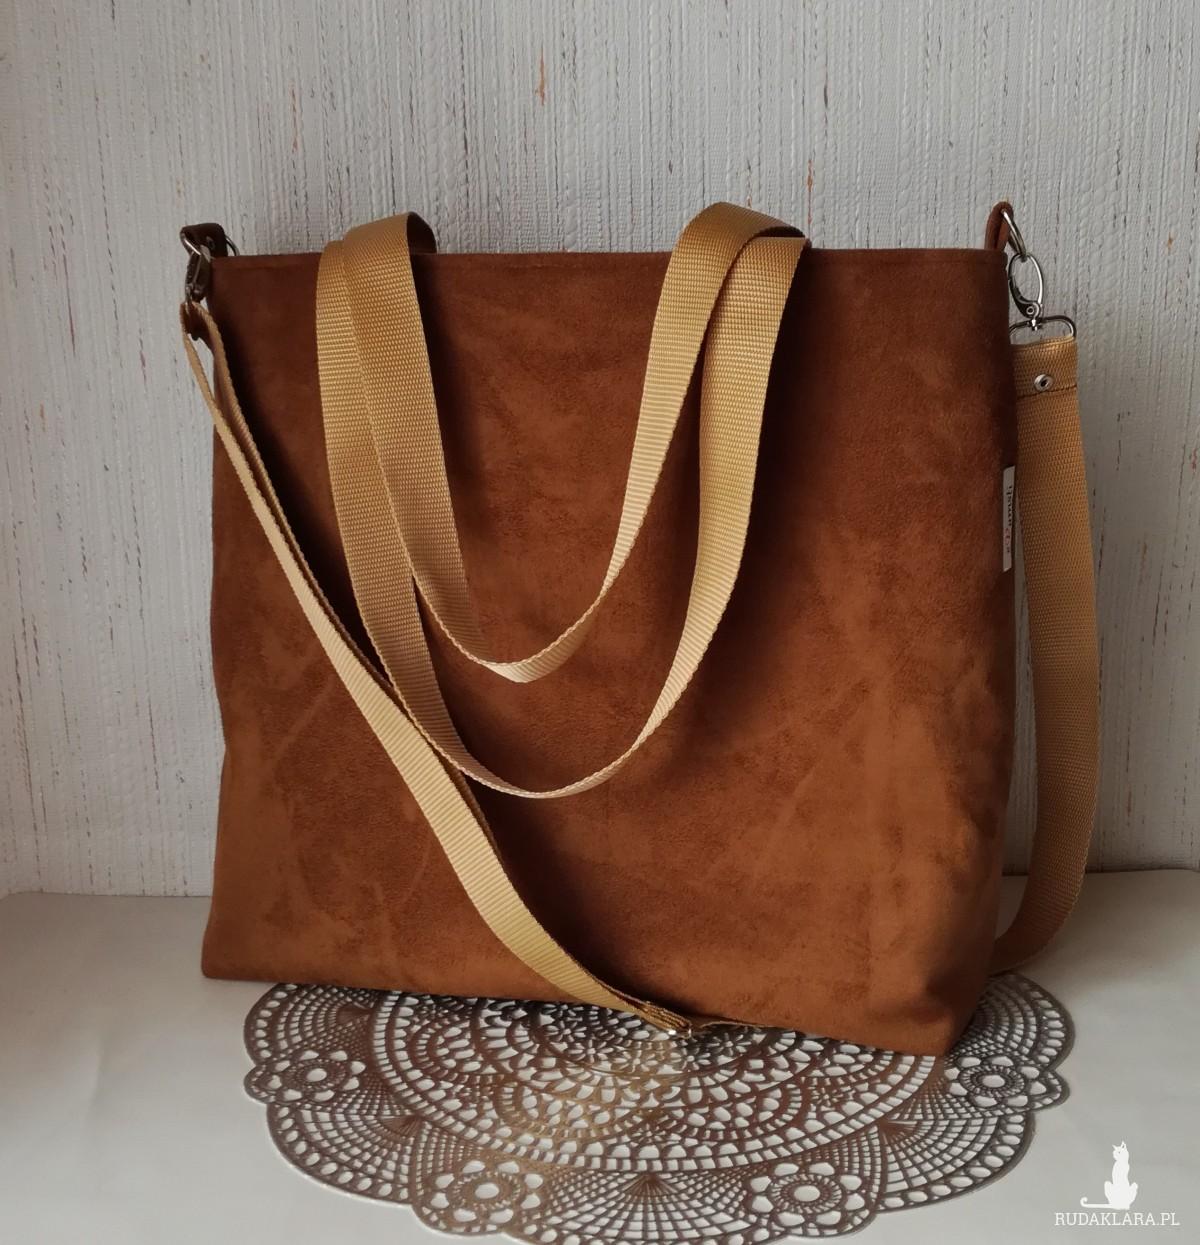 Torebka damska wodoodporna shopper bag torebka na ramię torebka do ręki handmade nubuk zamsz karmel